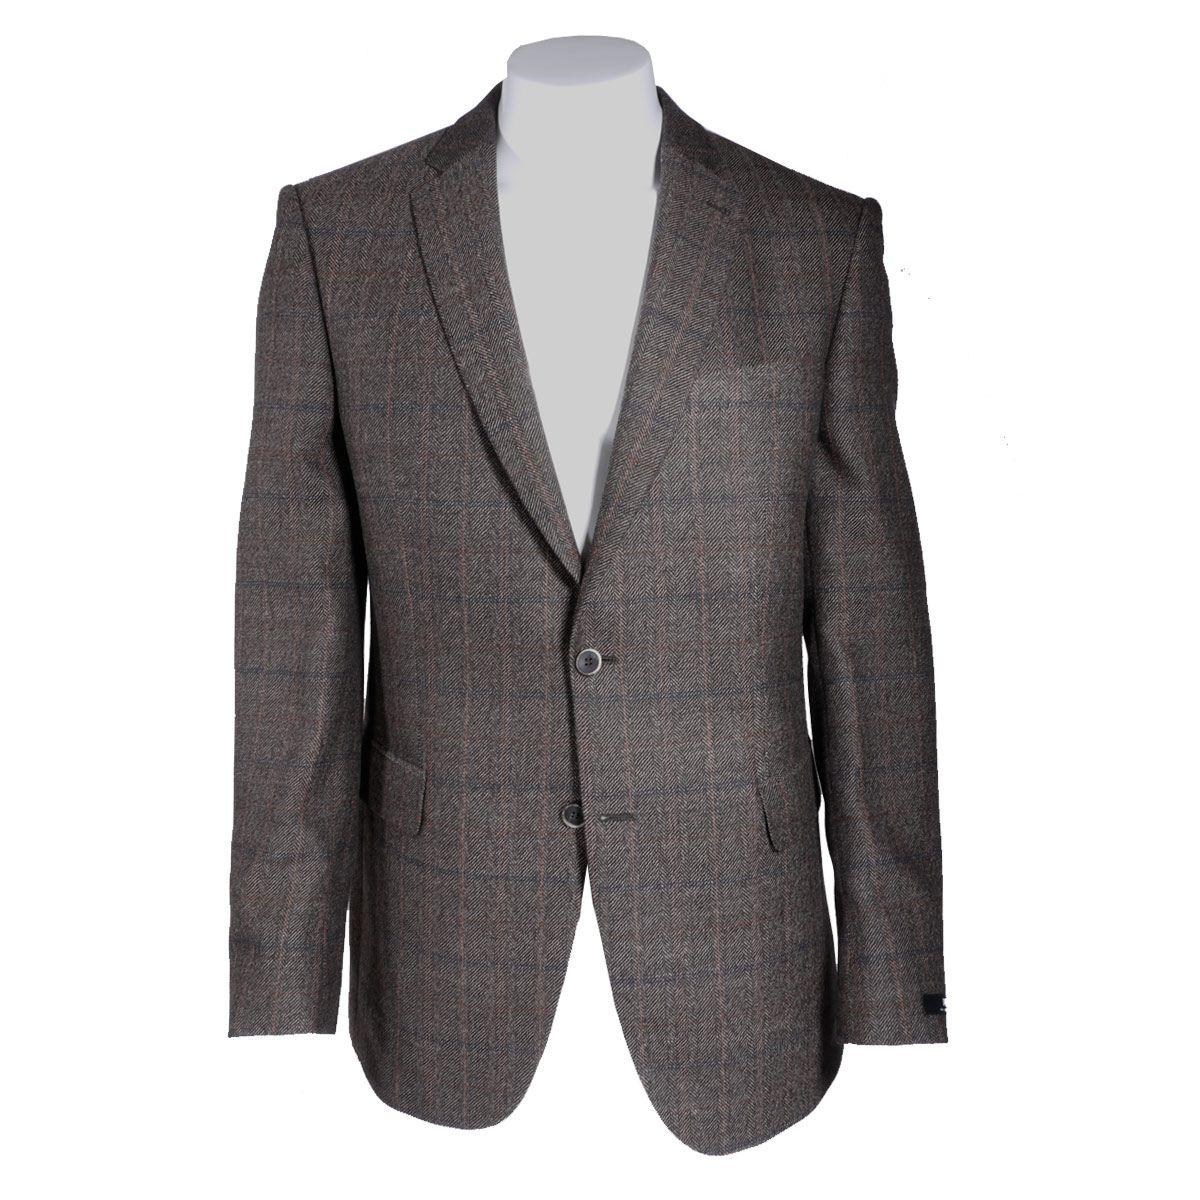 veste marron pour homme grand du 54 au 62 digel. Black Bedroom Furniture Sets. Home Design Ideas